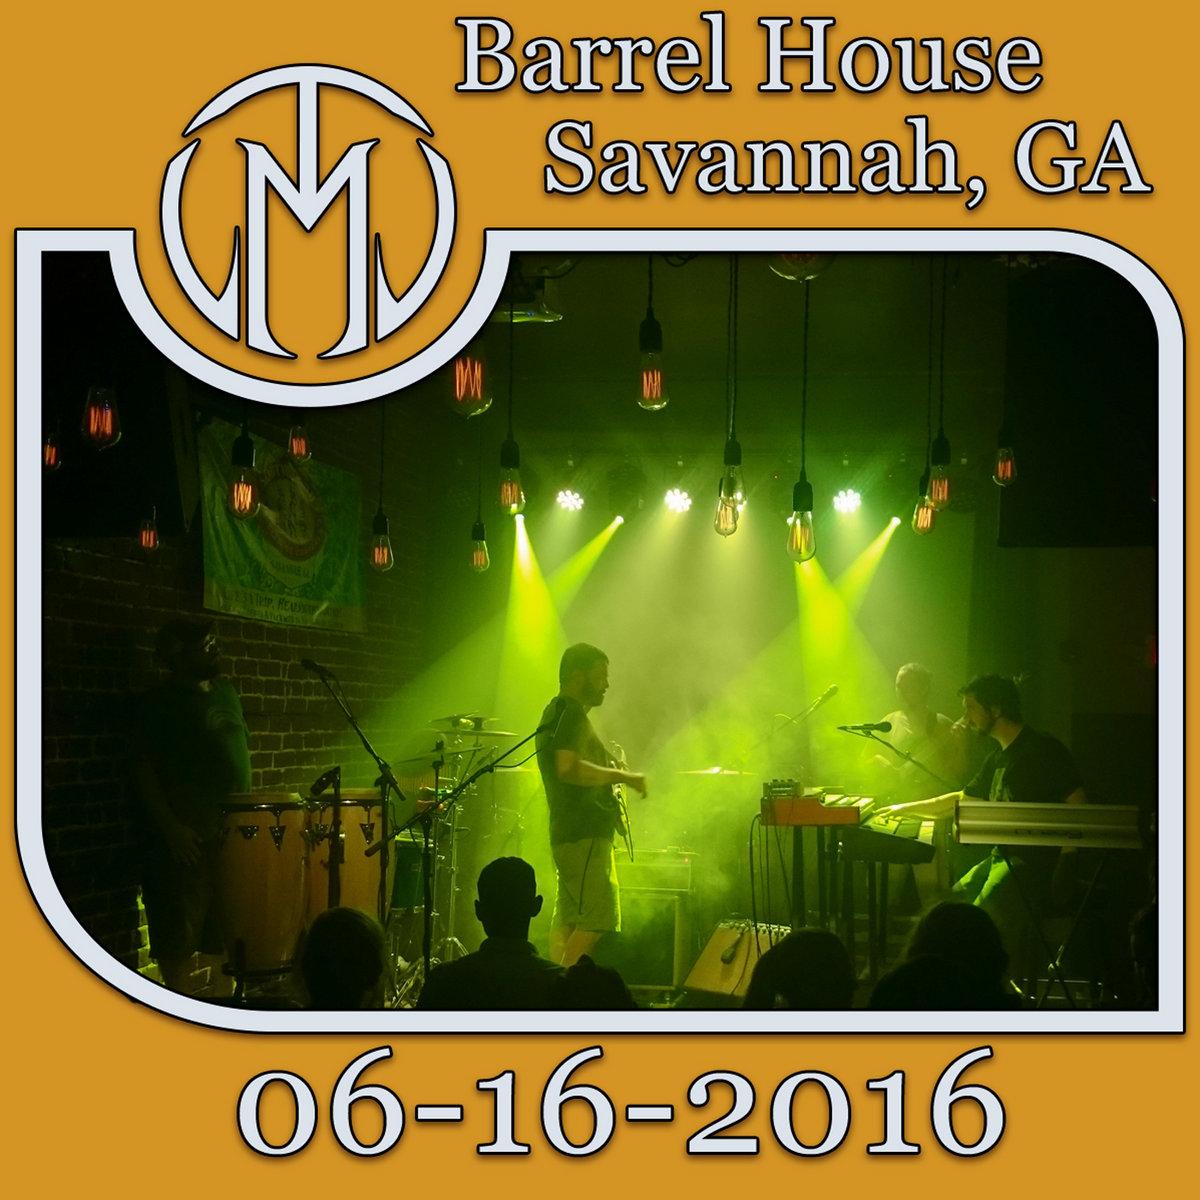 Barrel house savannah ga